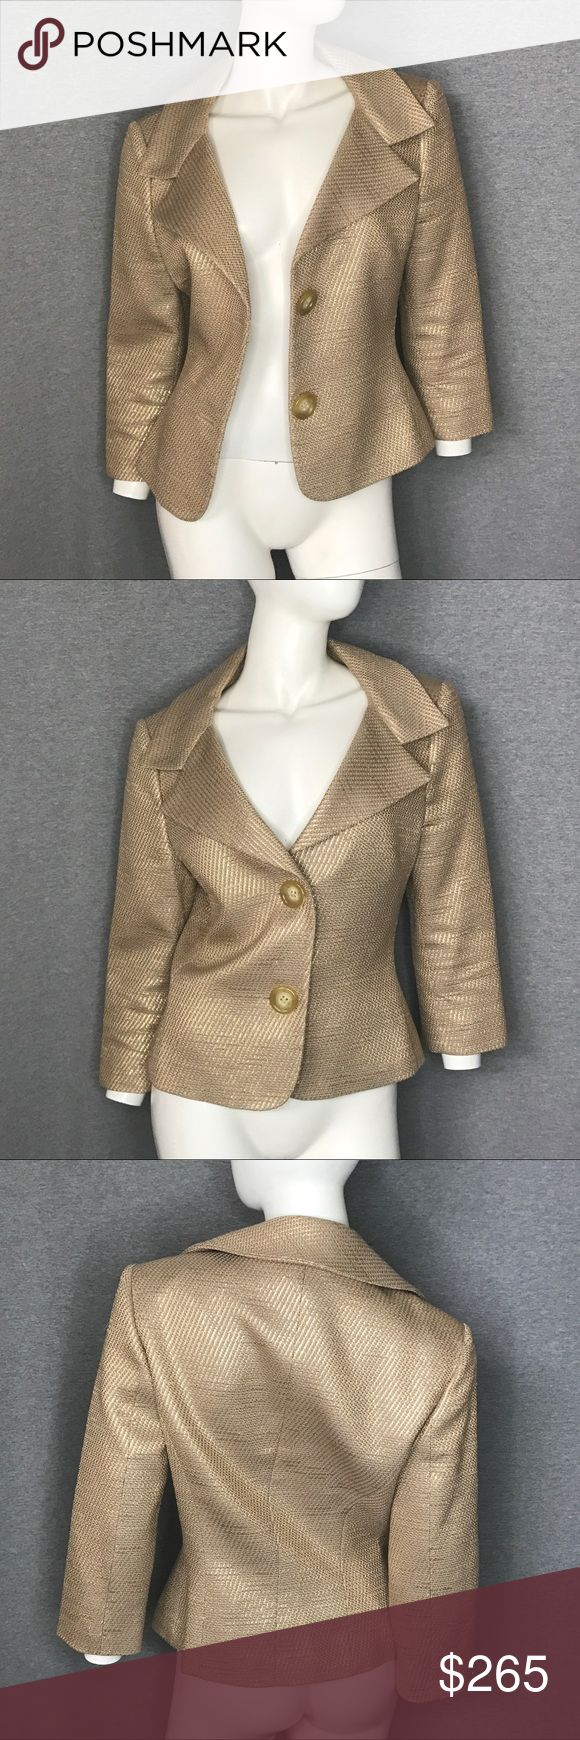 MICHAEL KORS COLLECTION Gold Metallic Jacket MICHAEL KORS COLLECTION Gold Metallic Jacket Michael Kors Jackets & Coats